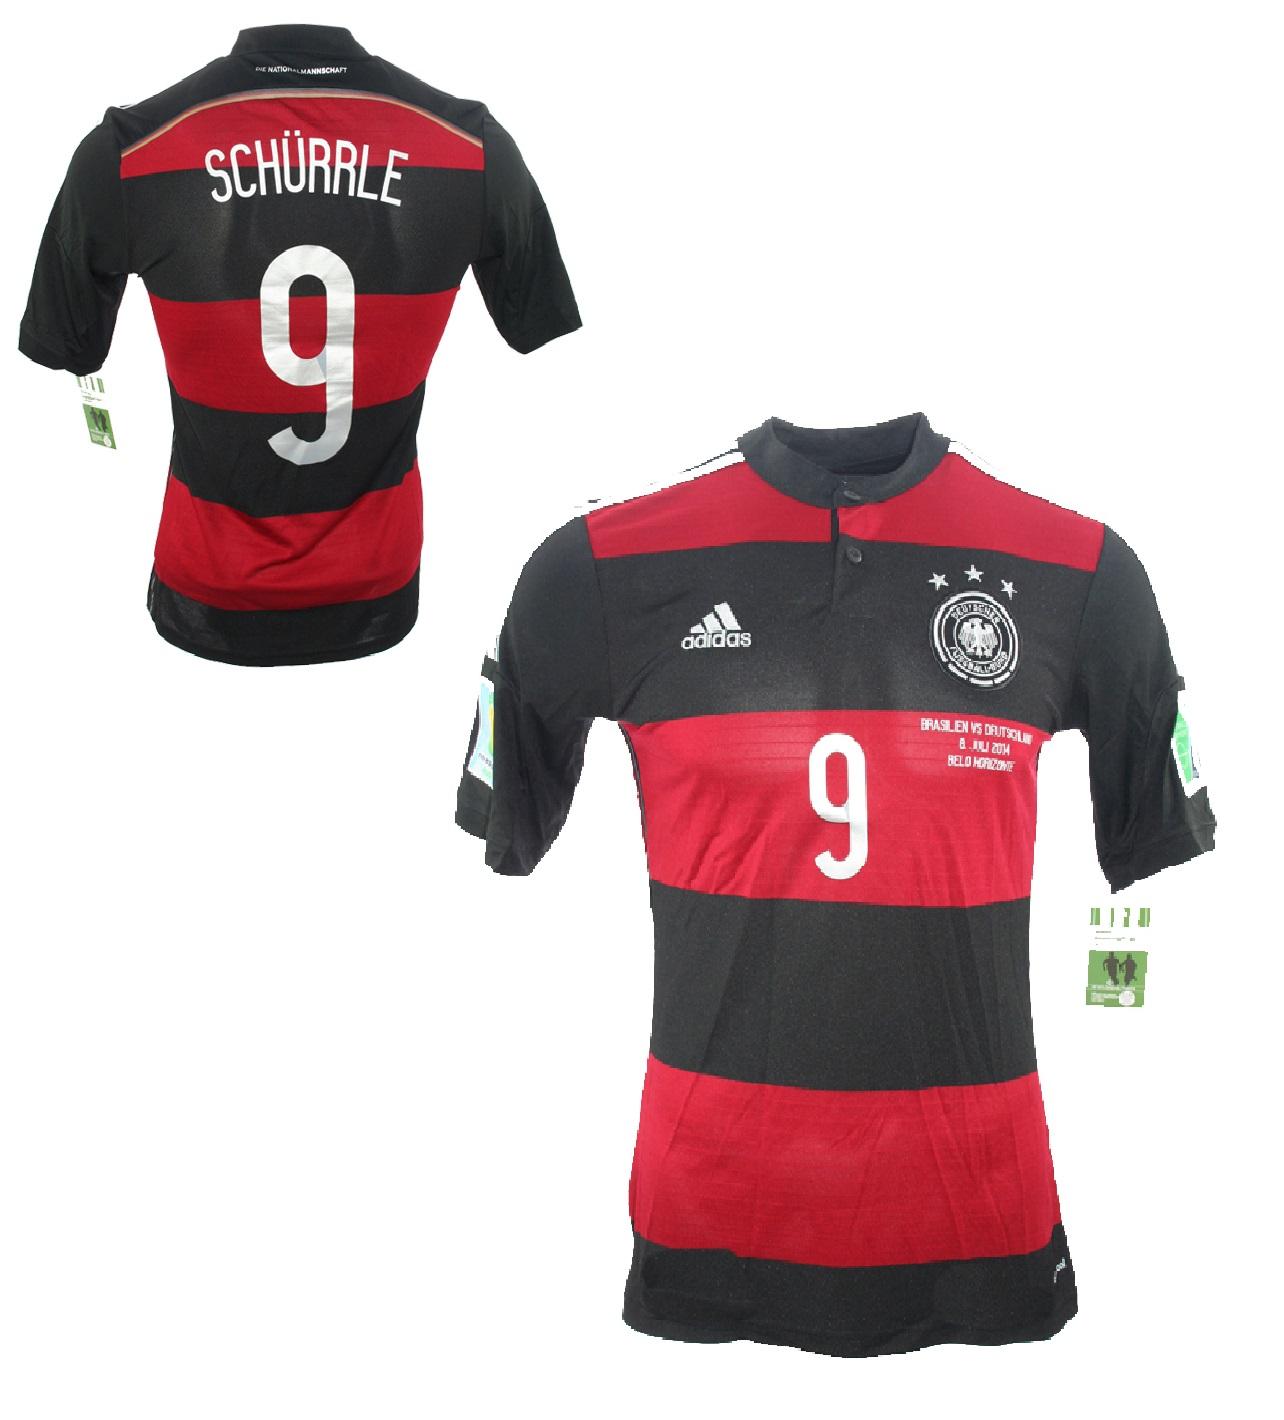 2de7f09d63f91 Adidas Deutschland Trikot 9 Andre Schürrle WM 2014 Away DFB Patches Herren S